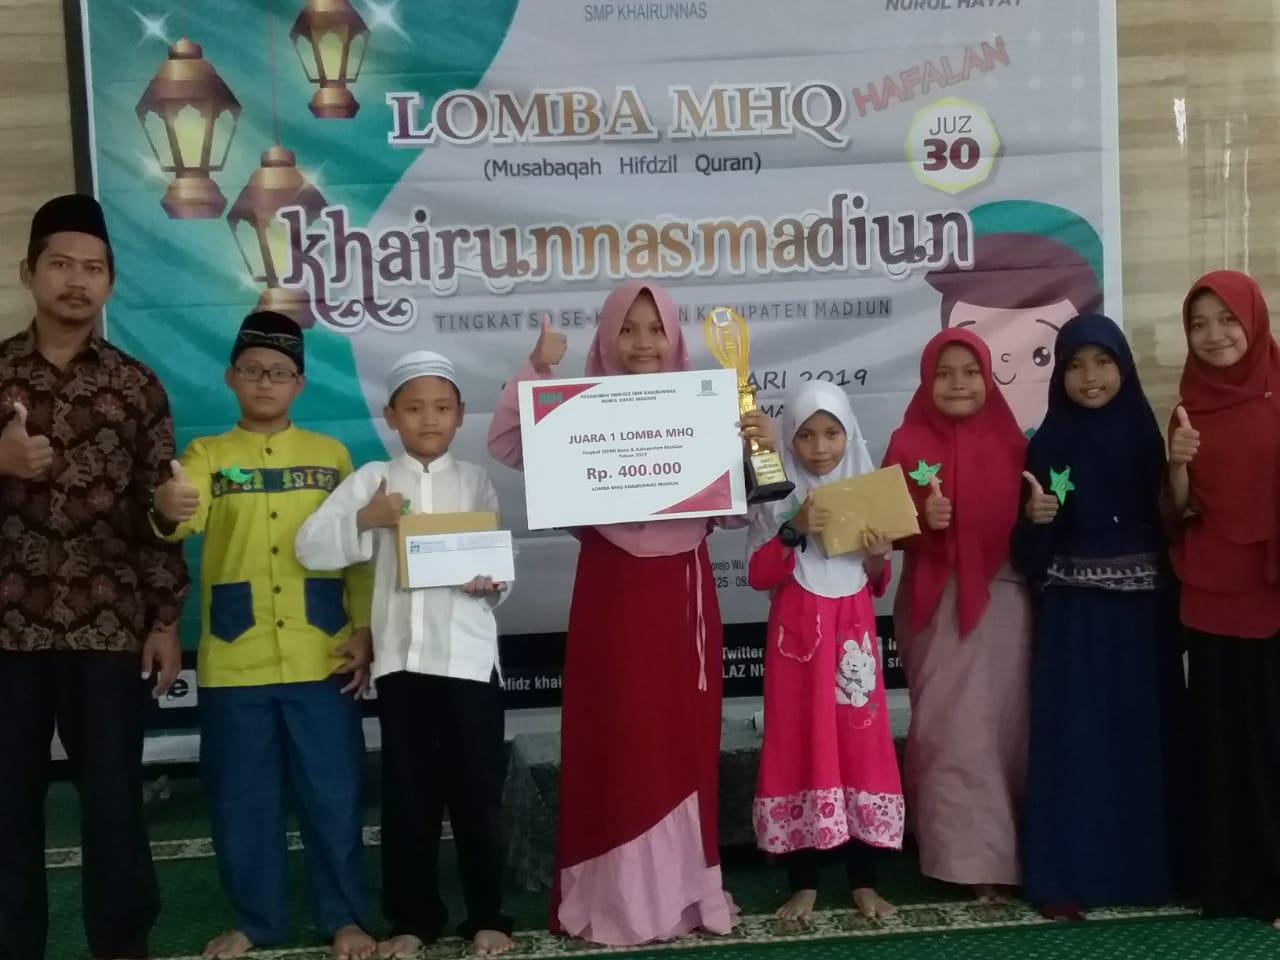 MIN 2 Kota Madiun Sabet Juara I Musabaqah Hifdzil Qur'an (MHQ) Tingkat Karesidenan Madiun